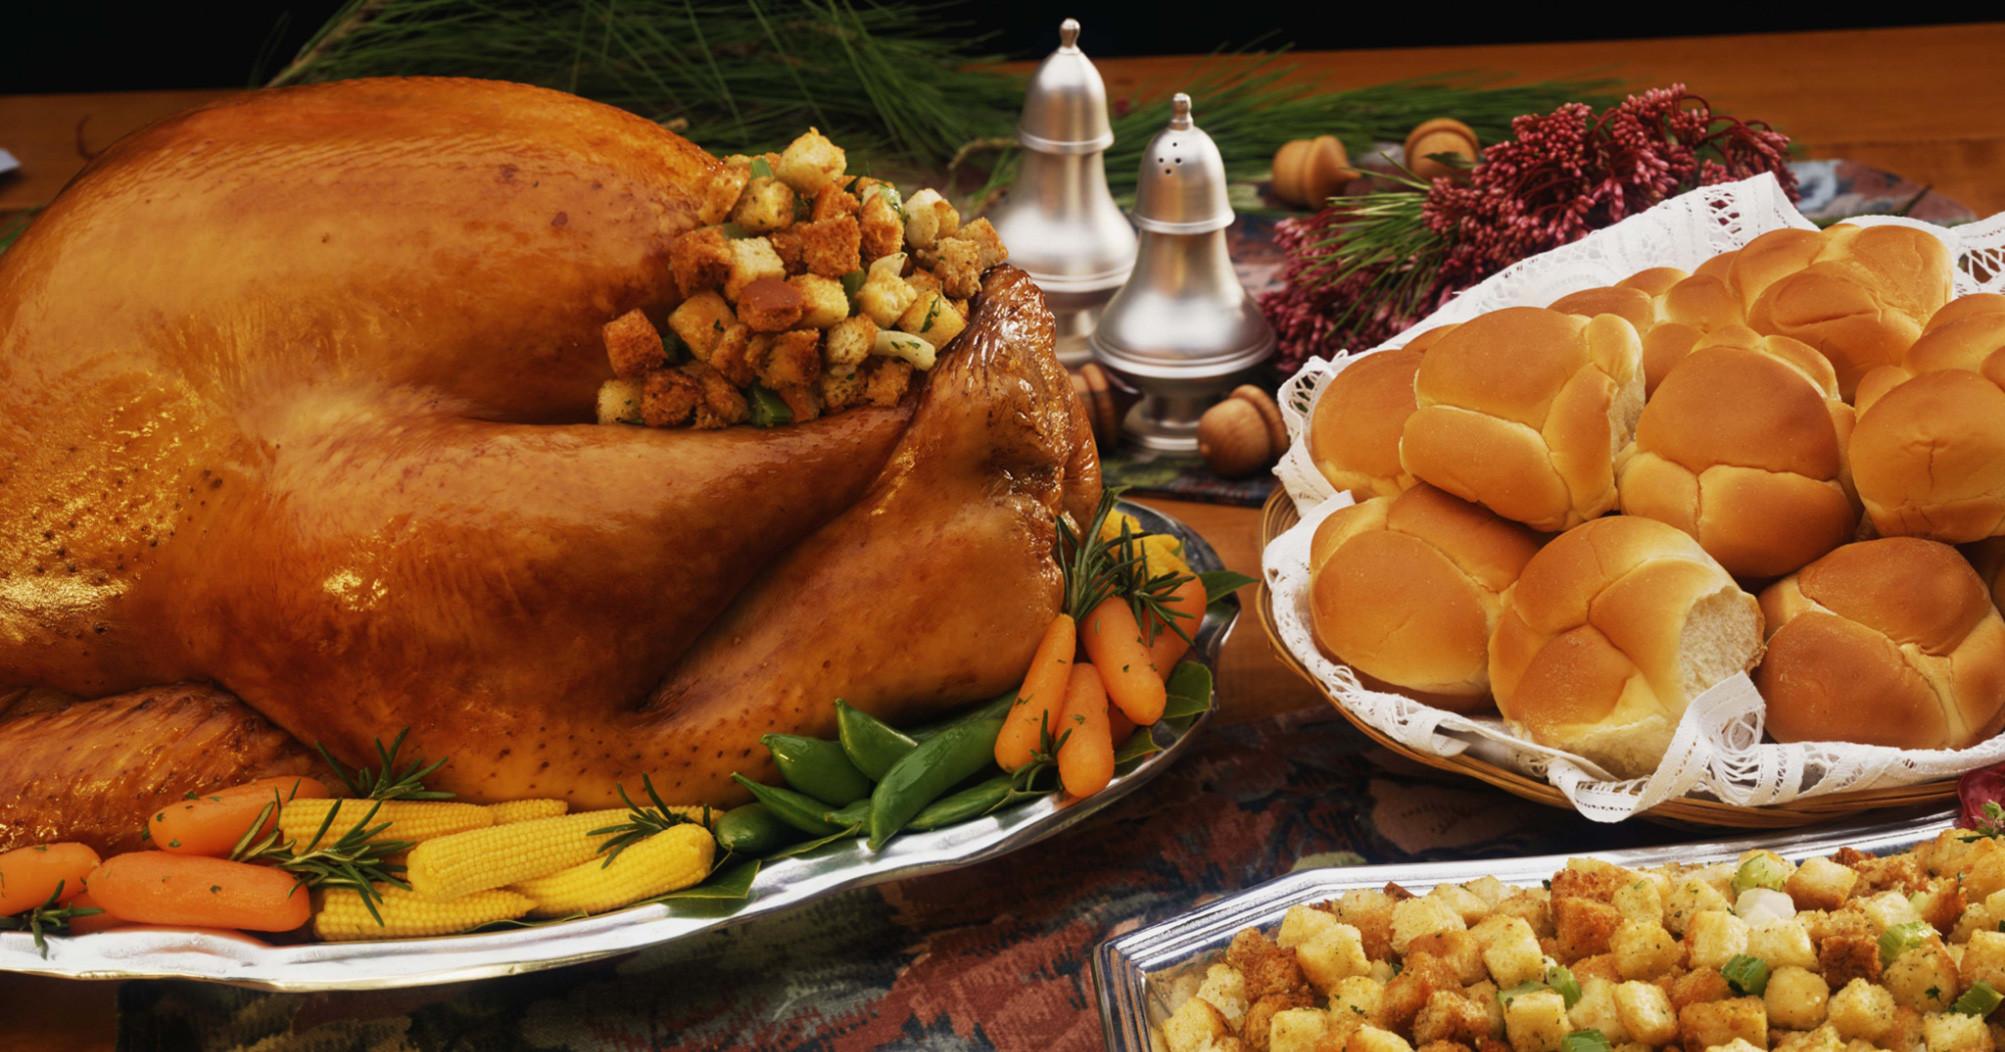 Wegmans Turkey Dinner Thanksgiving 2019  Mange Prie Shoppe un Thanksgiving à l américaine